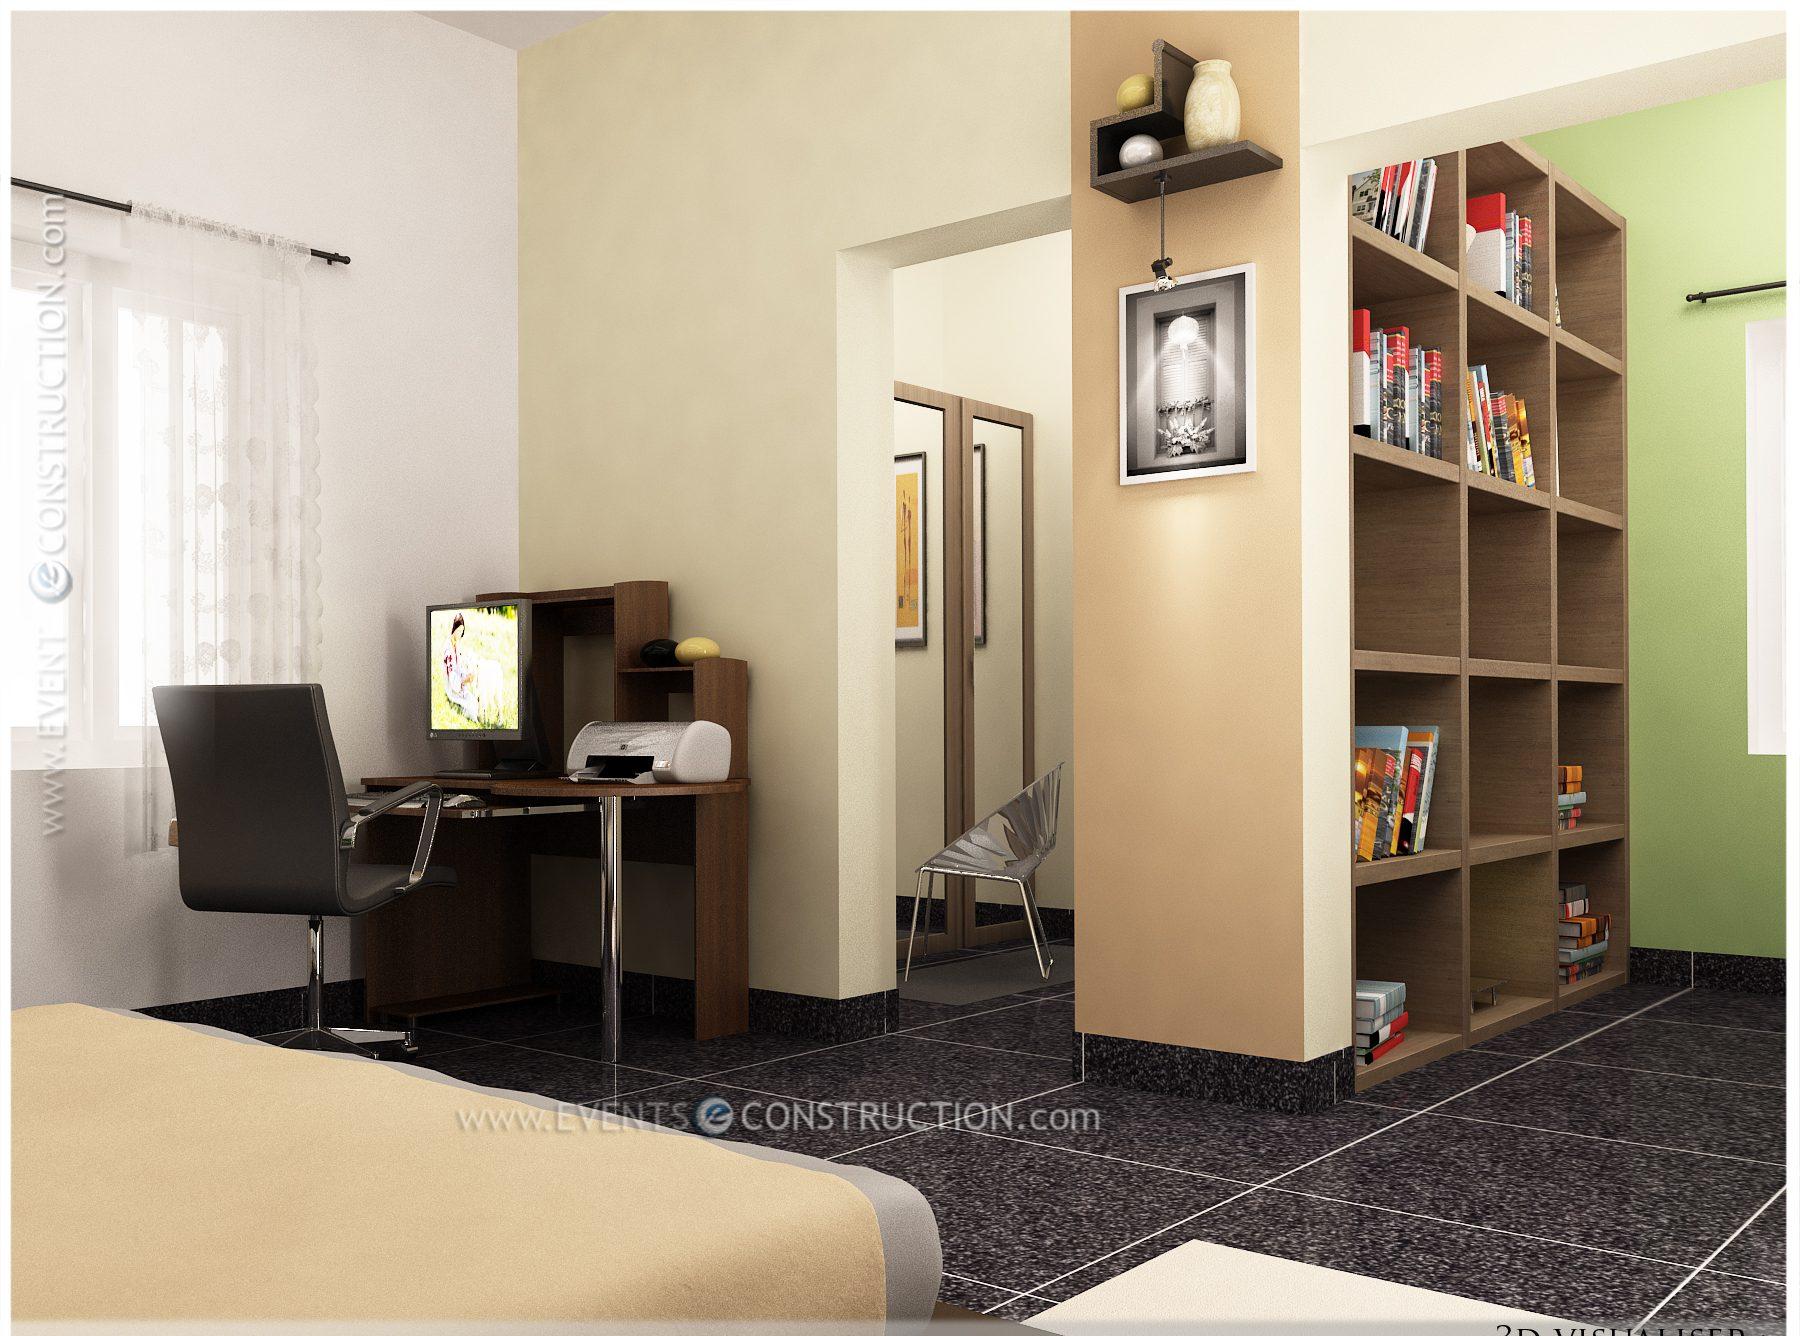 Evens Construction Interiors